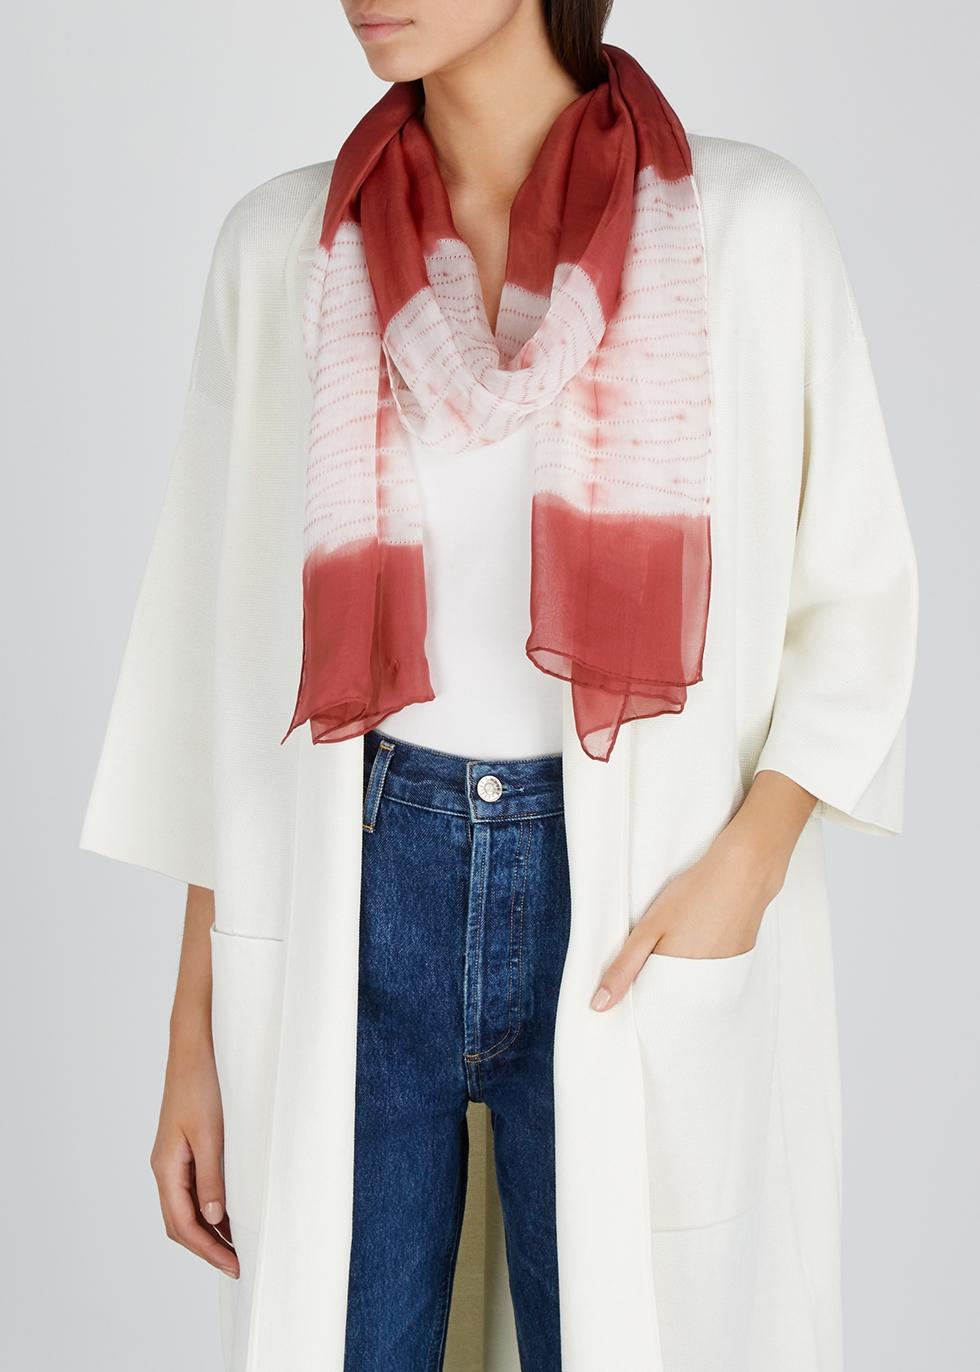 Rose tie-dye silk scarf - EILEEN FISHER